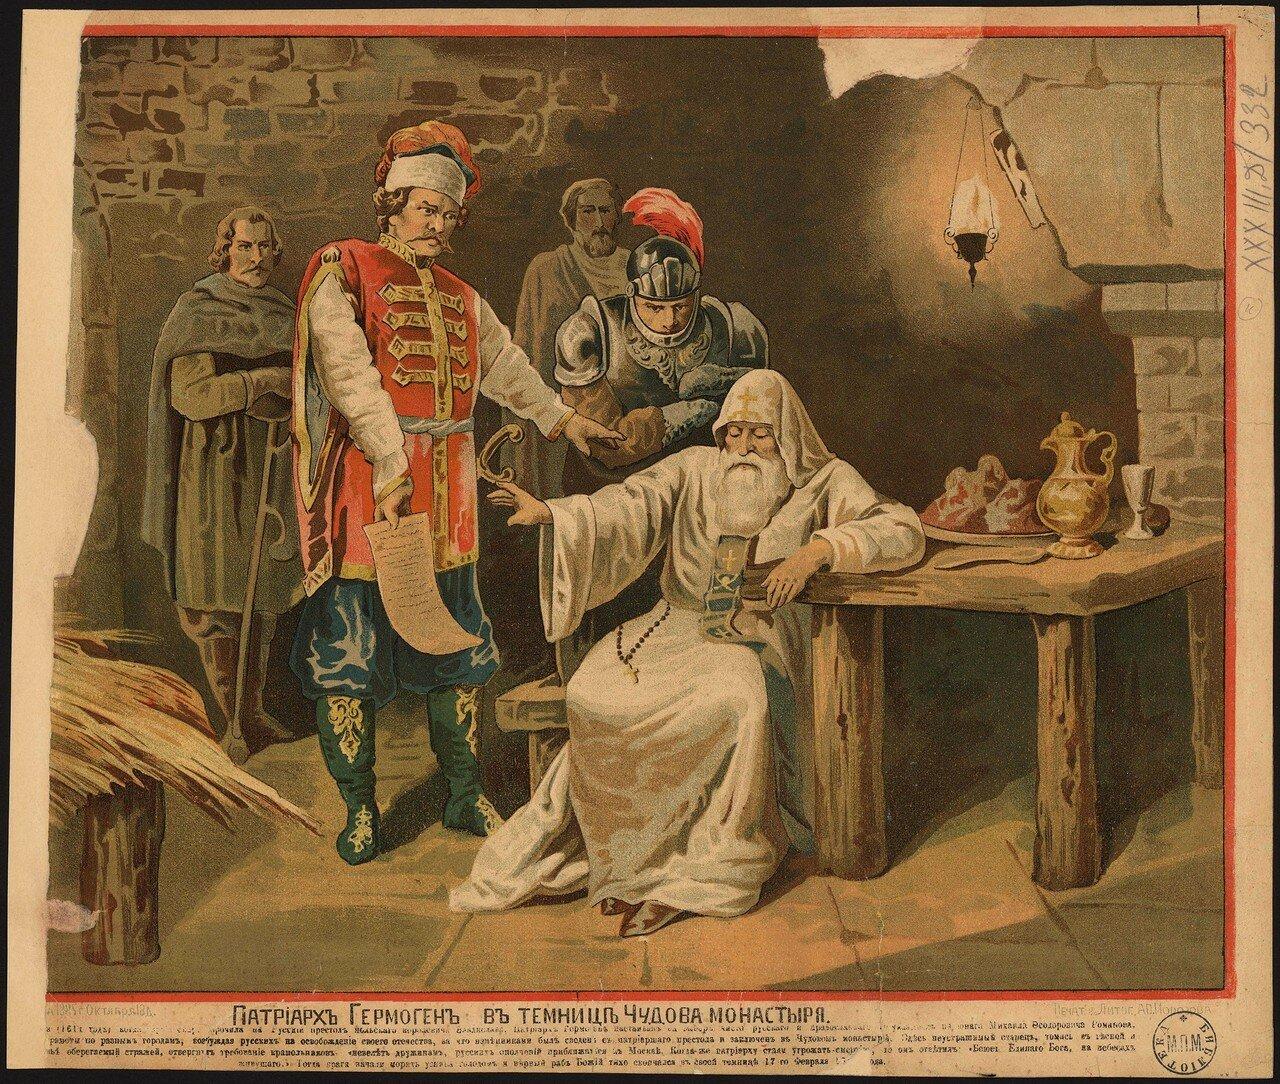 Патриарх Гермоген в темнице Чудова монастыря